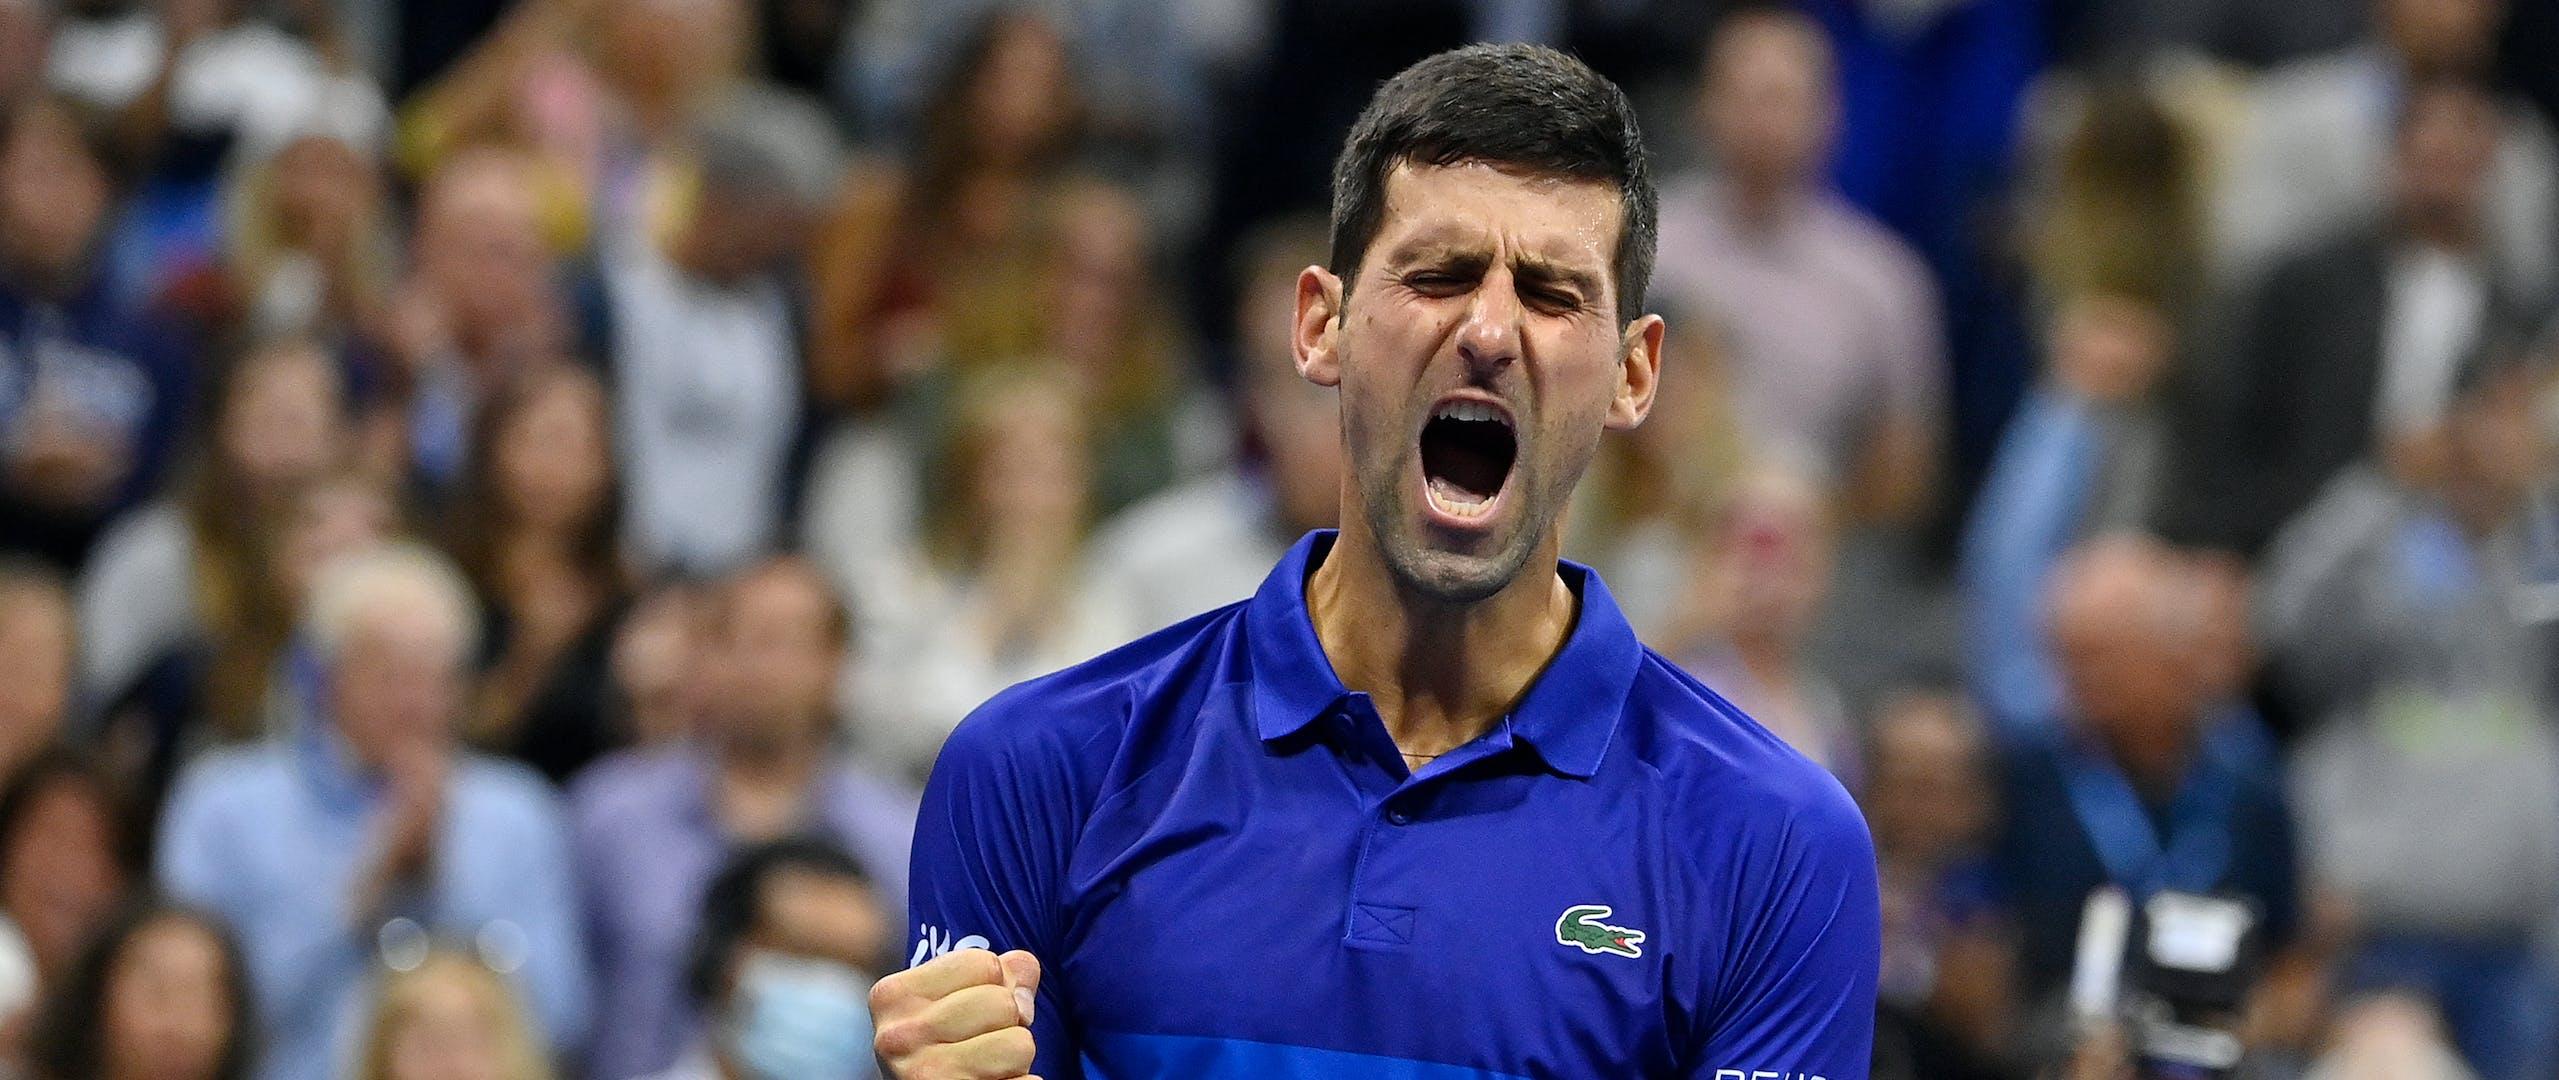 Roaring Novak Djokovic